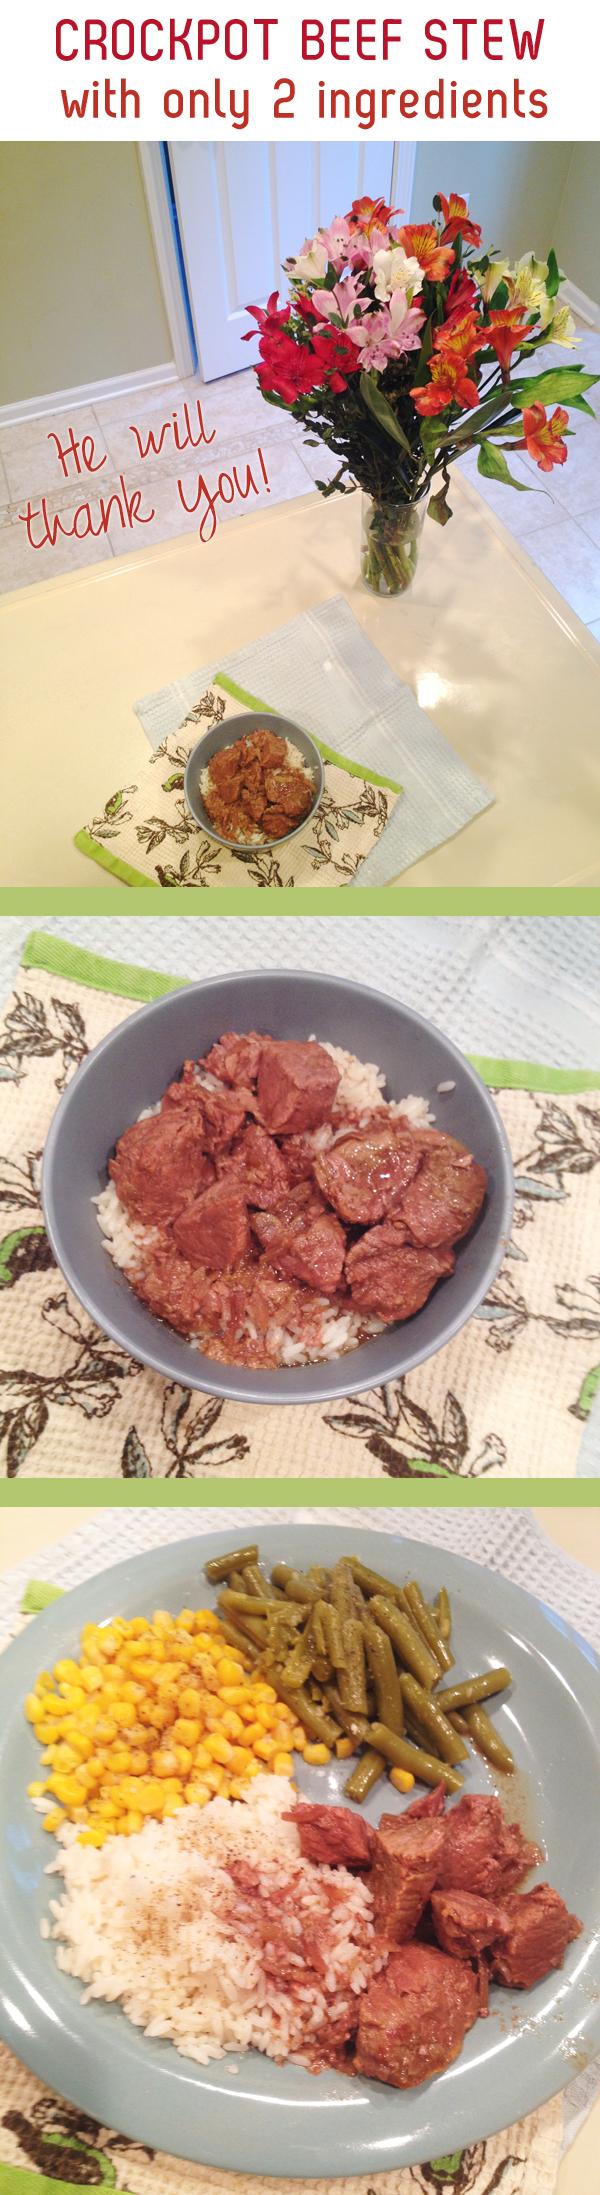 easy weeknight crockpot beef stew